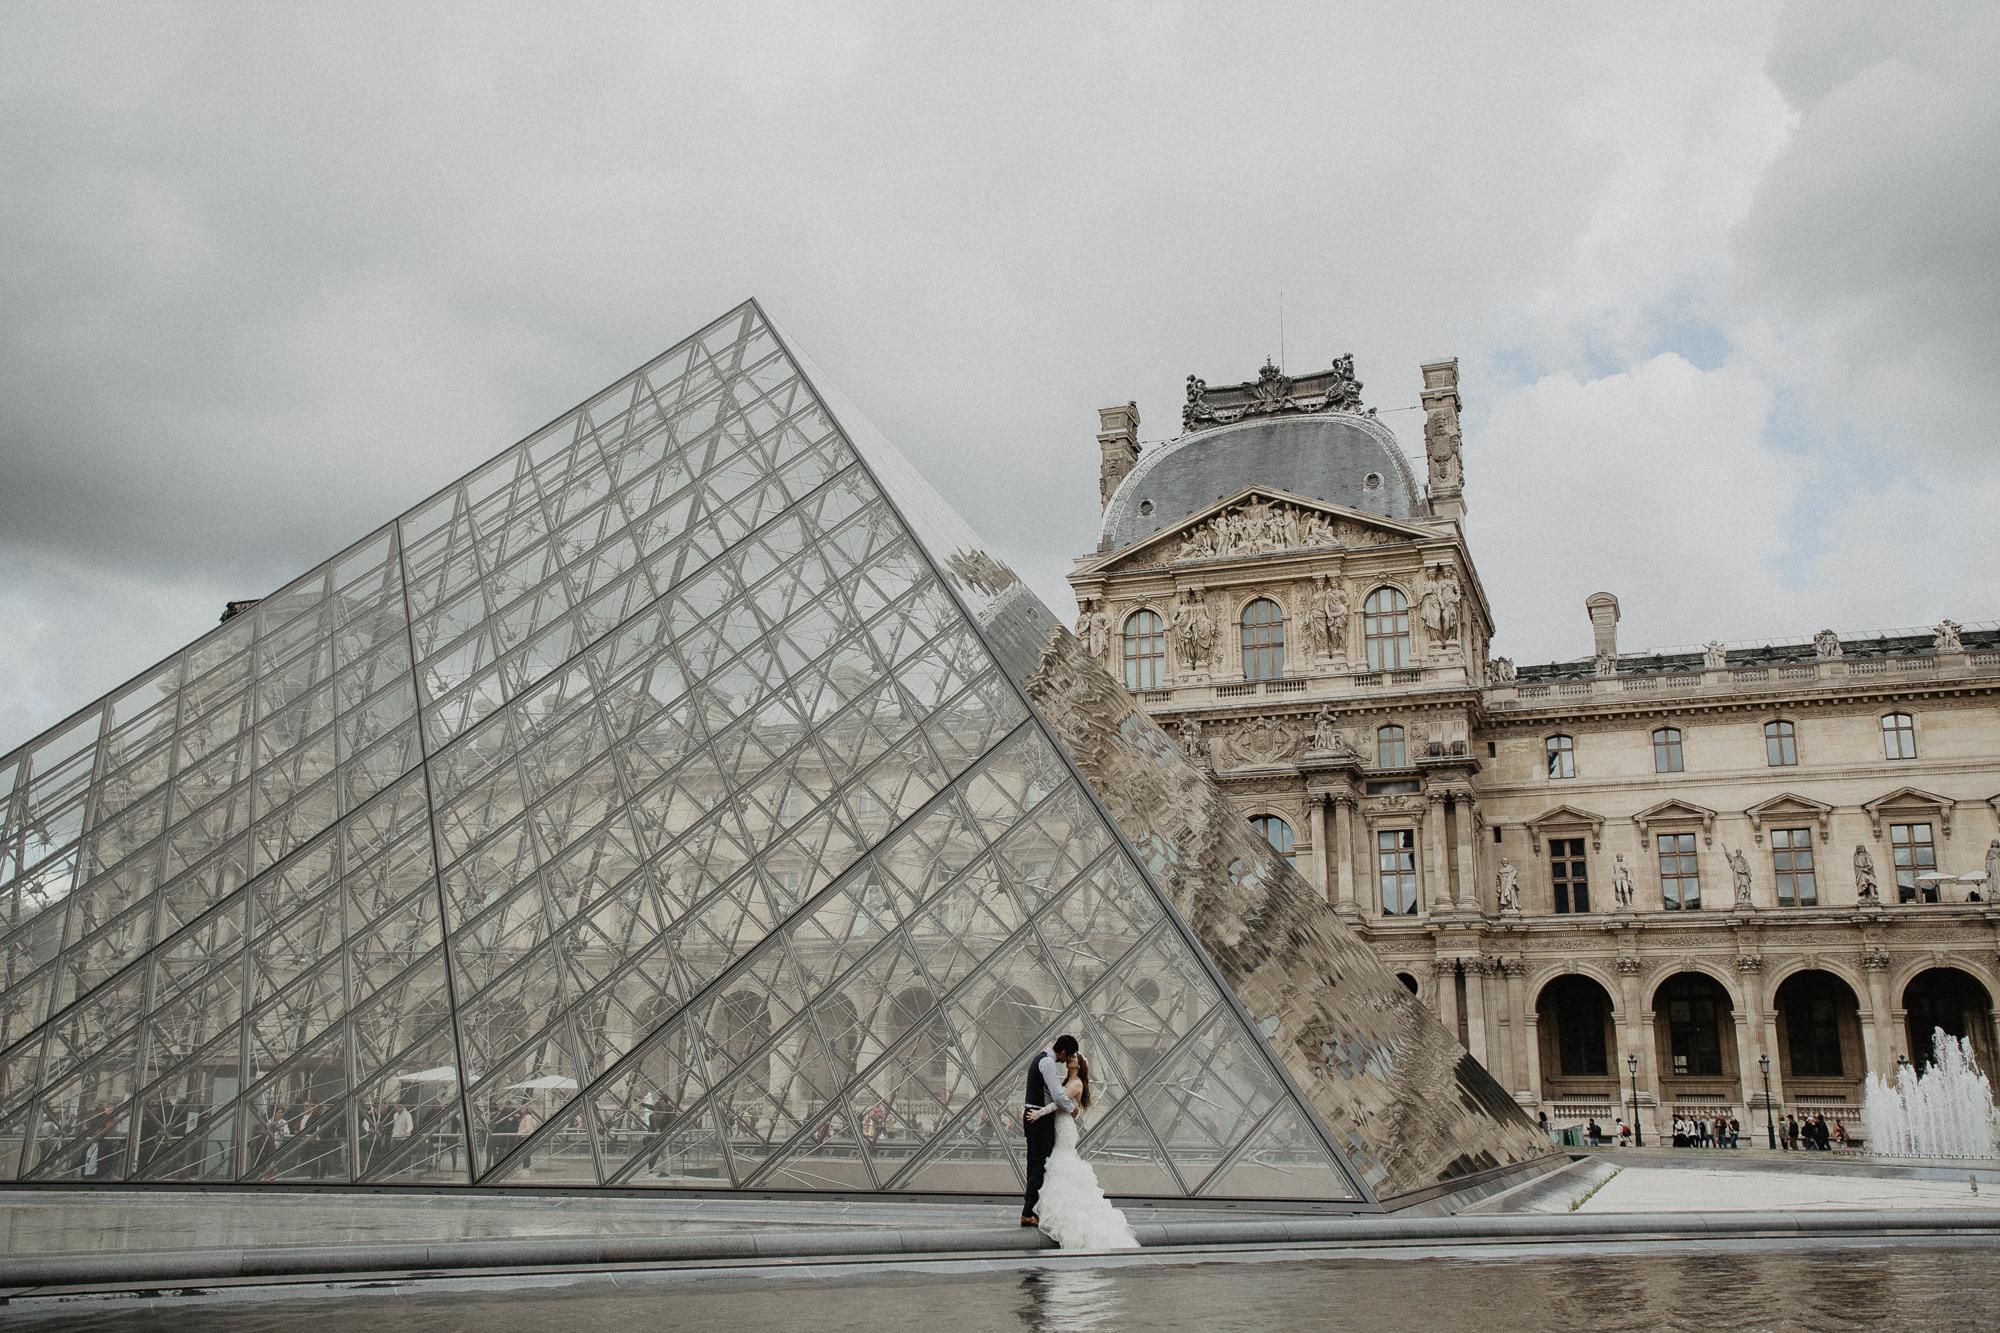 Wedding photo louvre pyramid paris